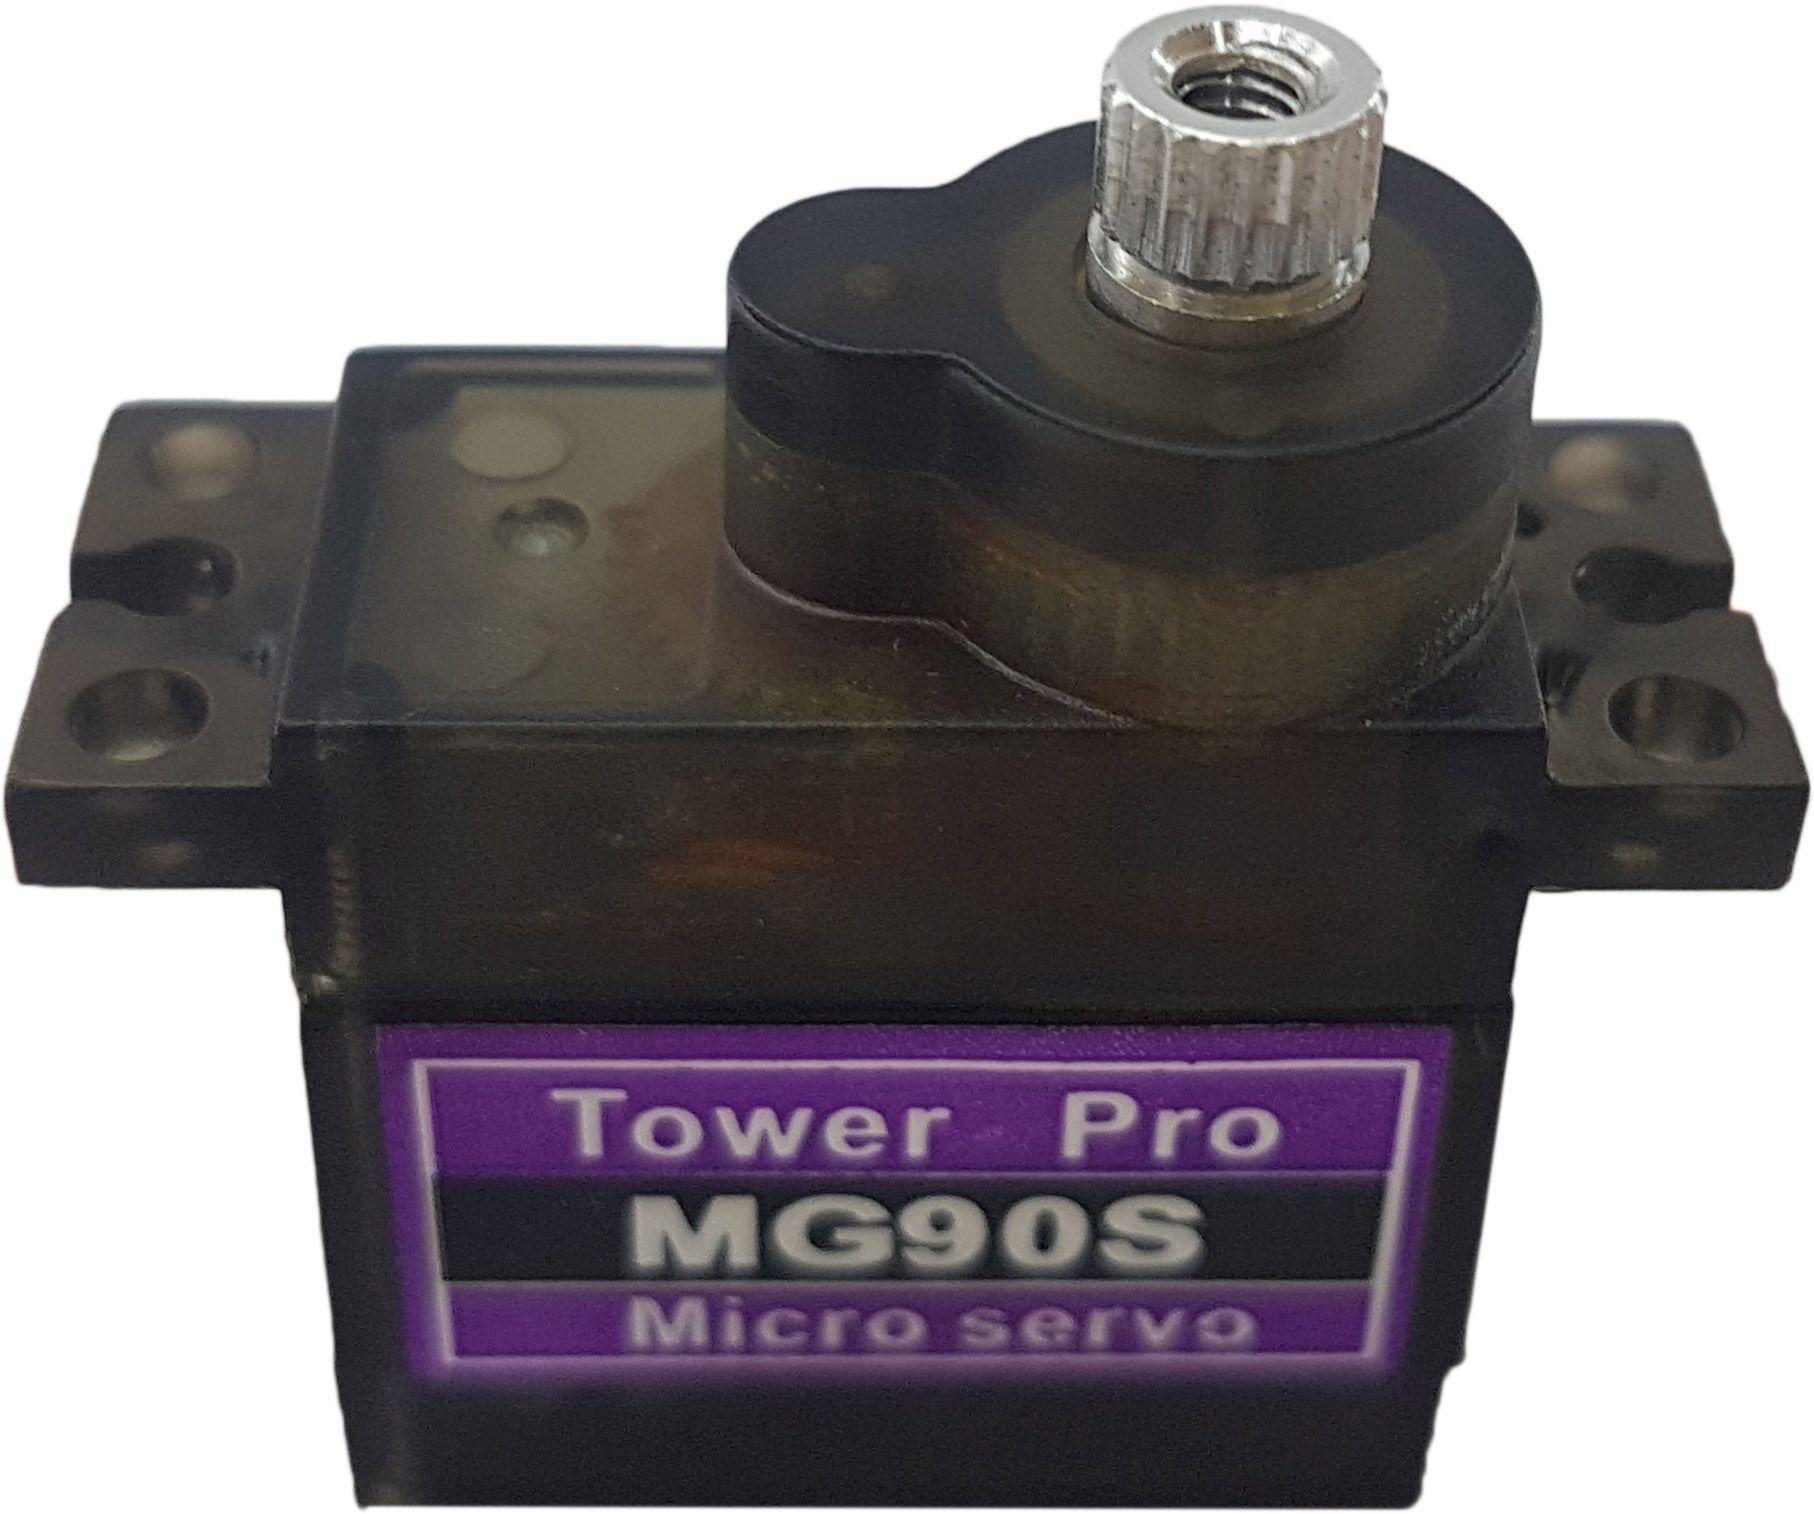 Micro servo 90g Metal